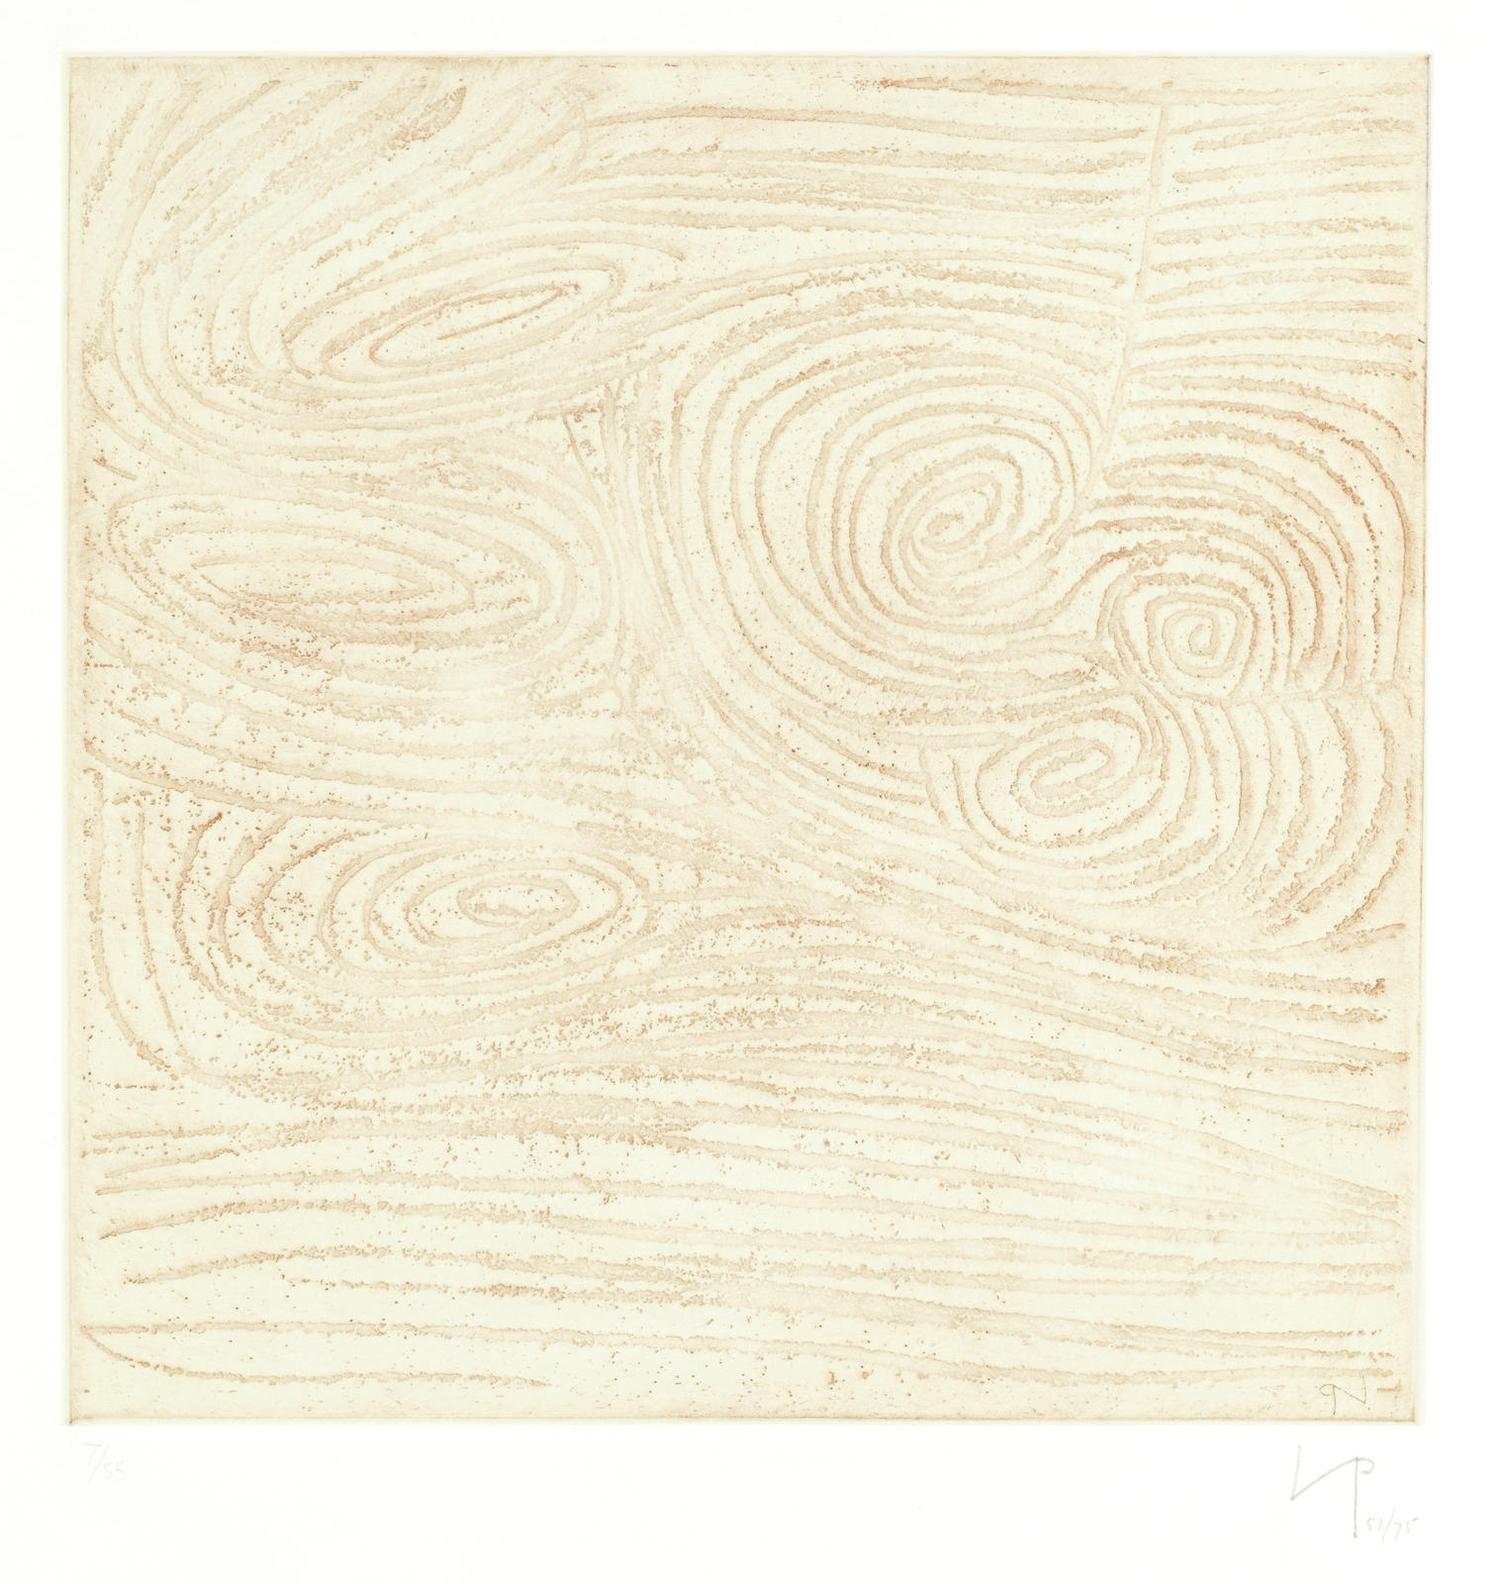 Victor Pasmore-Spiral Motif (Lynton, Supplement To T&H; 1)-1975